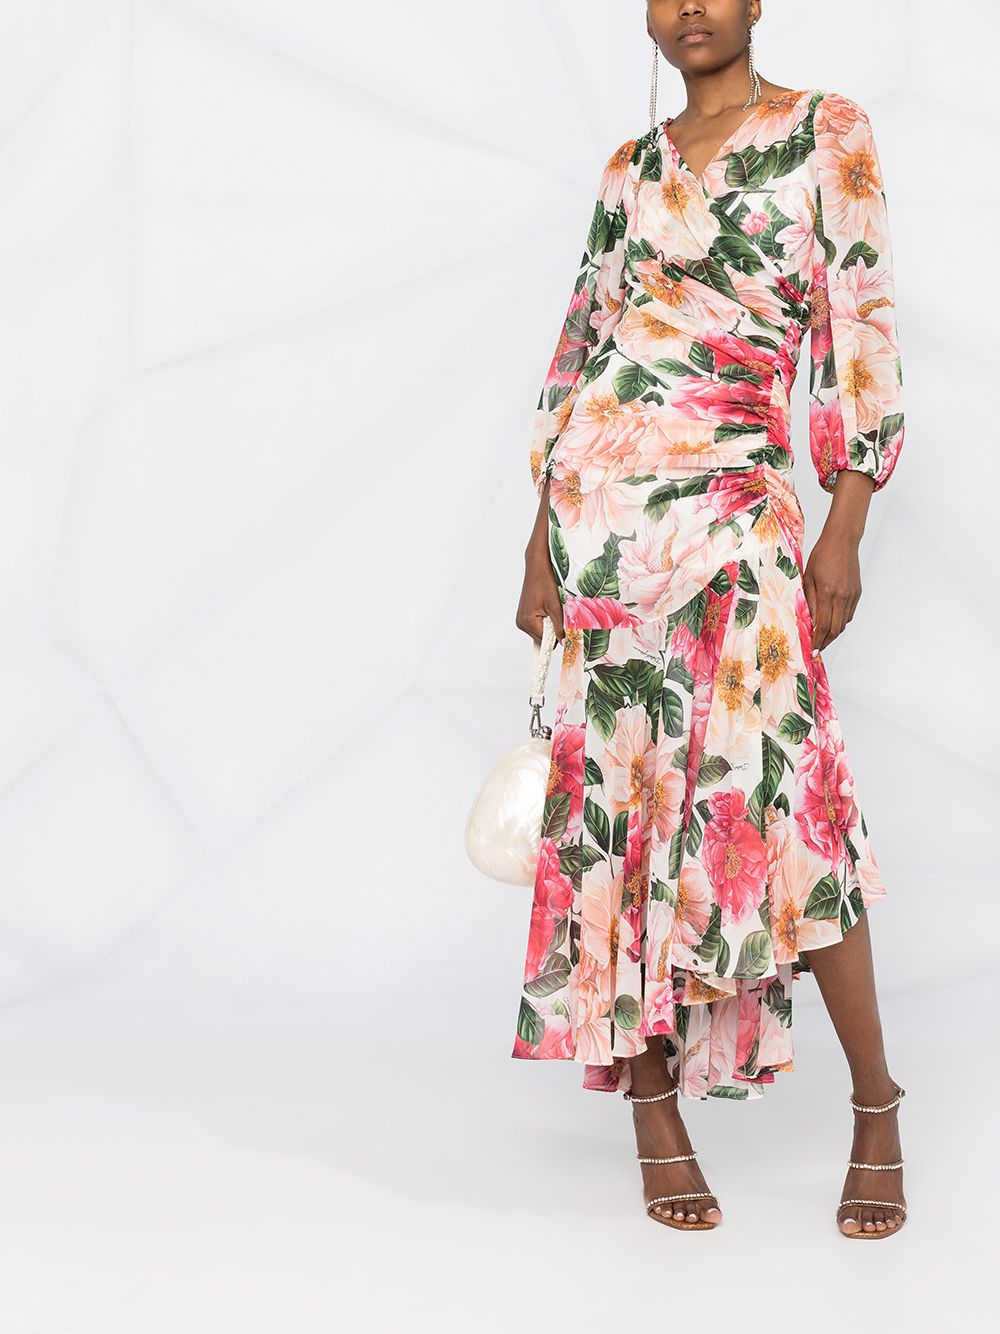 White,pink and green silk-georgette camellia-print asymmetric dress  DOLCE & GABBANA |  | F6I5UT-IS1FKHA2AI